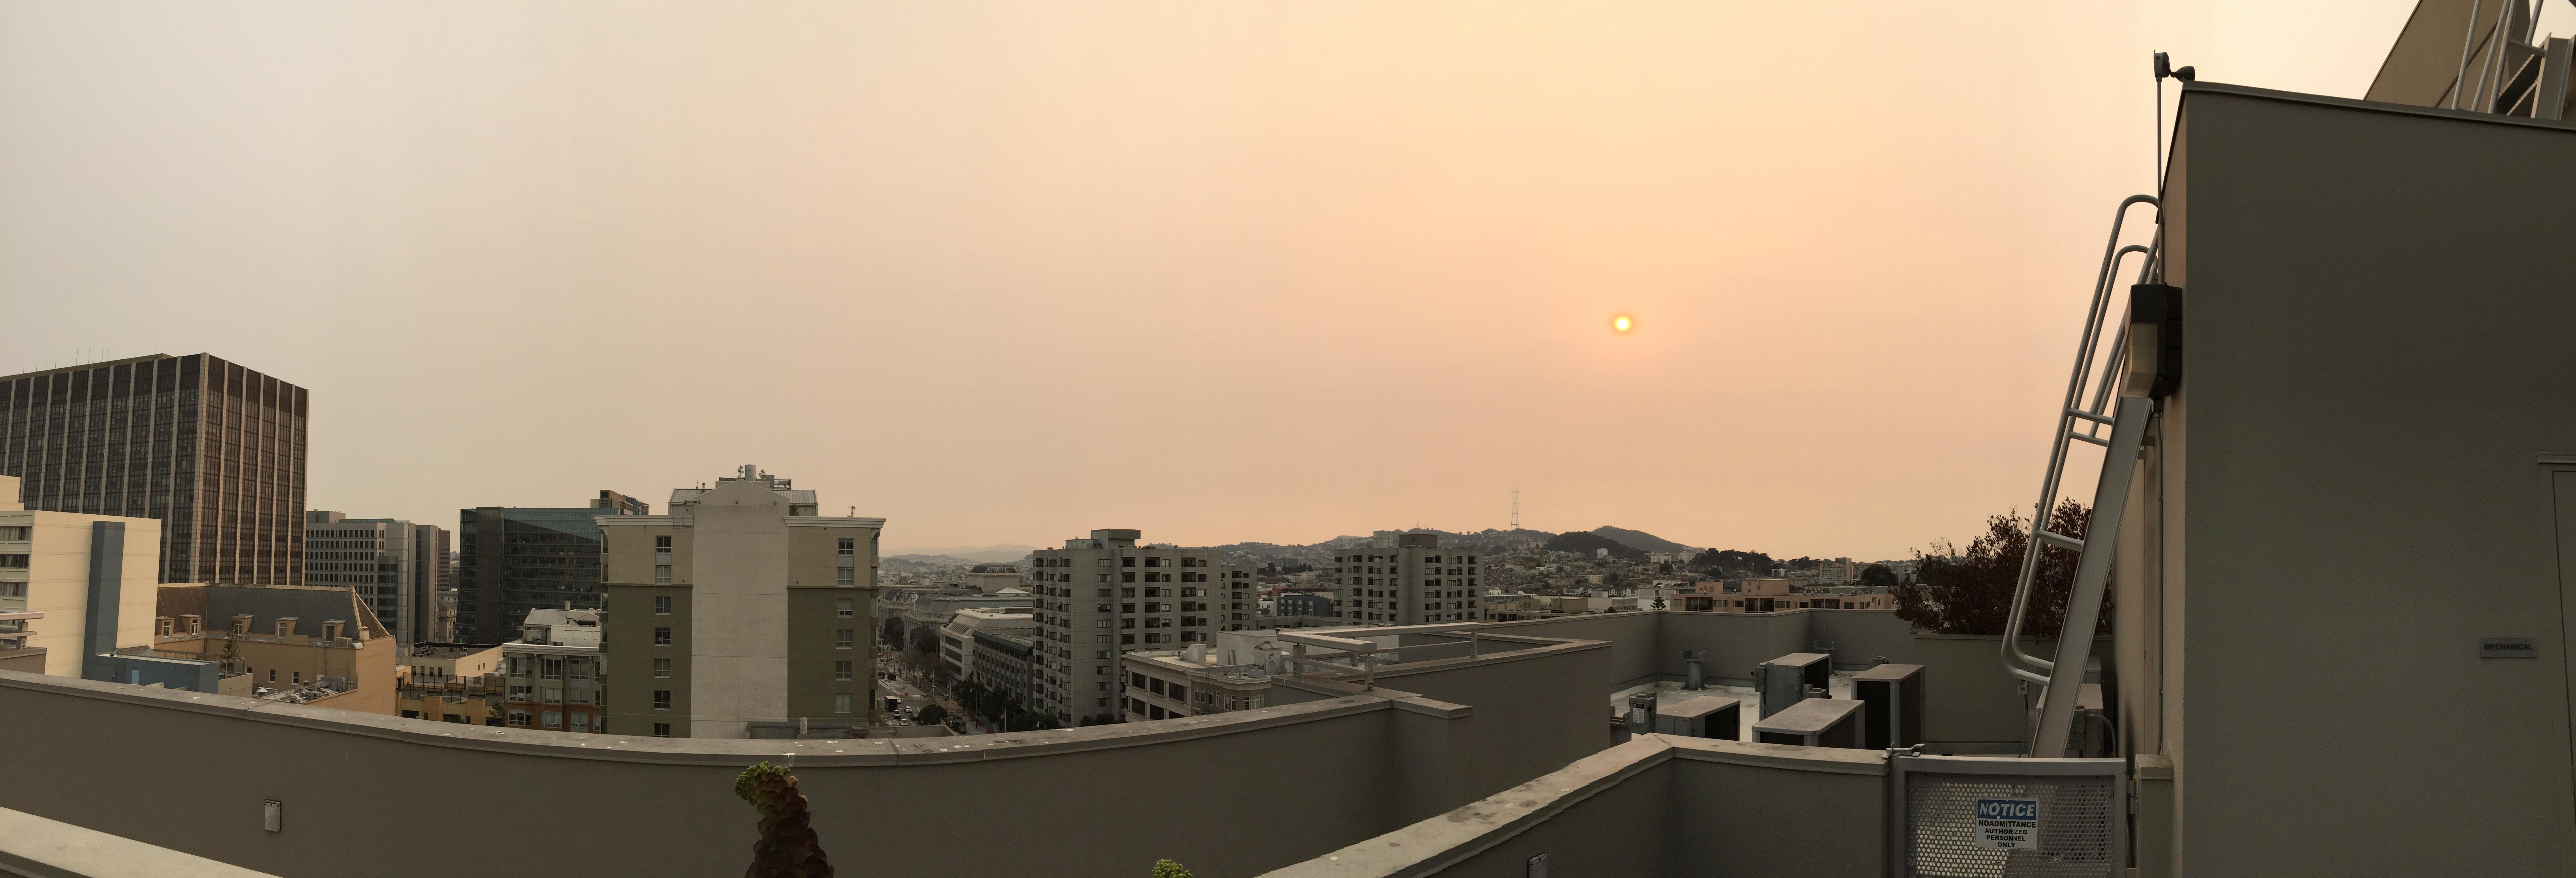 San Francisco 2049, @themartinharo/Instagram